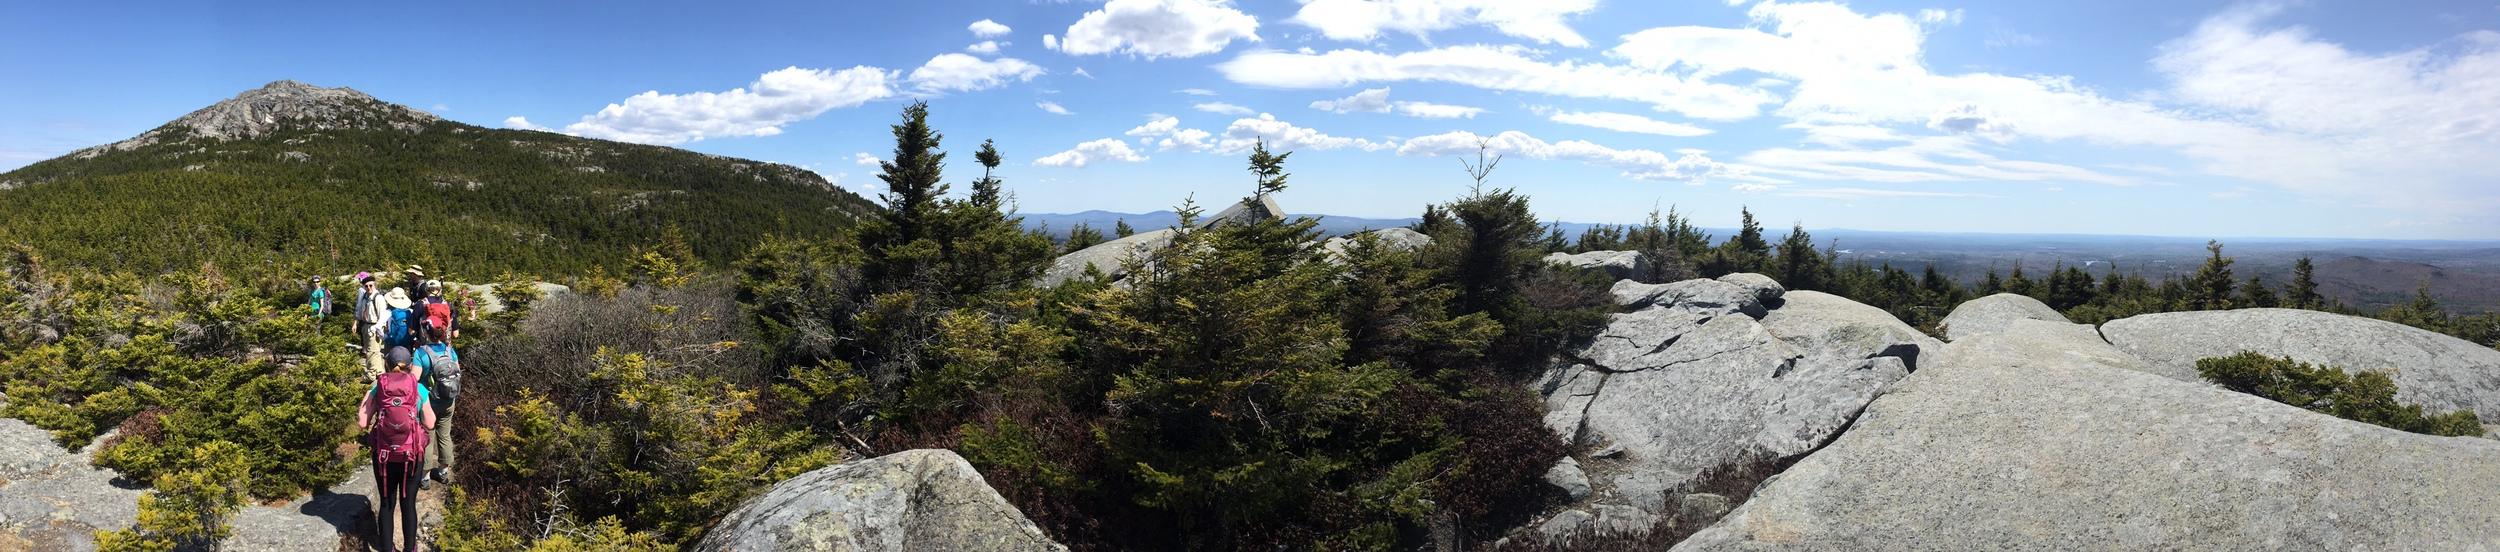 Mount Monadnock - 2 hours from Boston